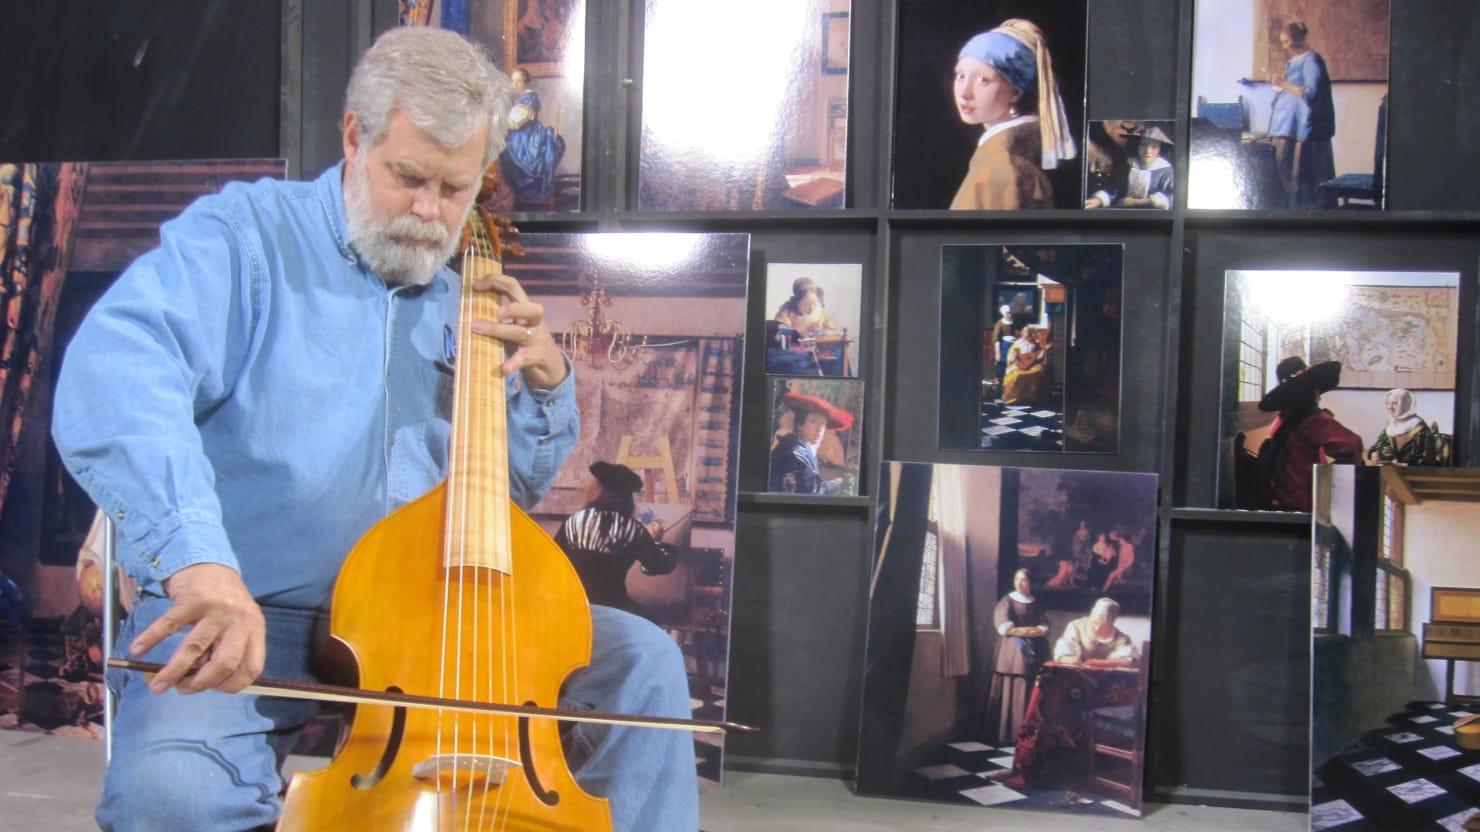 Can You Paint Like Johannes Vermeer, Too?